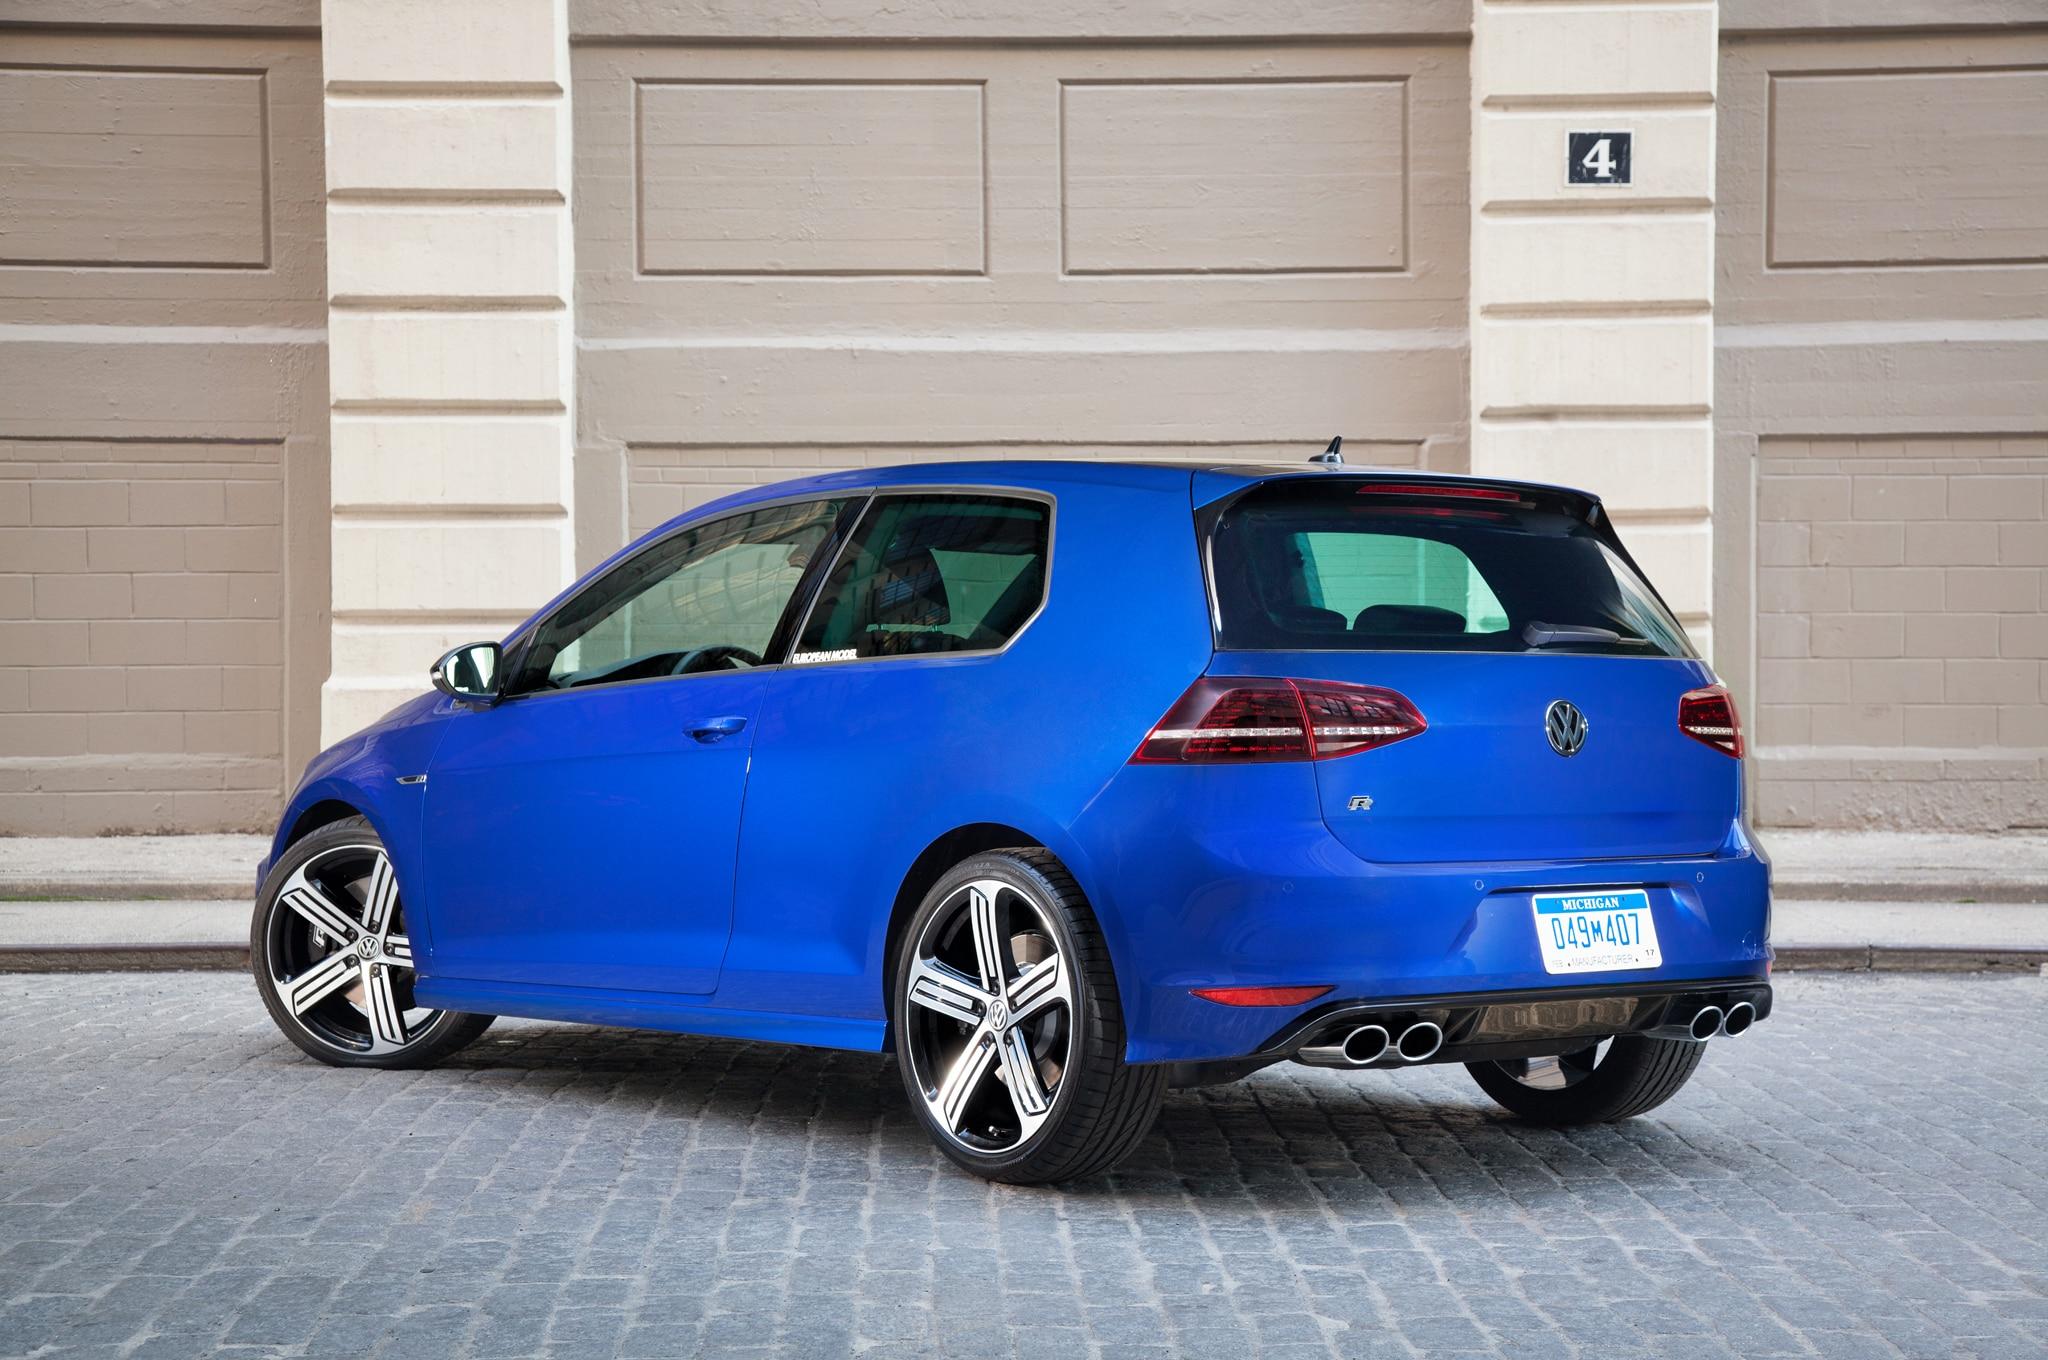 Vw golf r mk6 cars one love - Show More